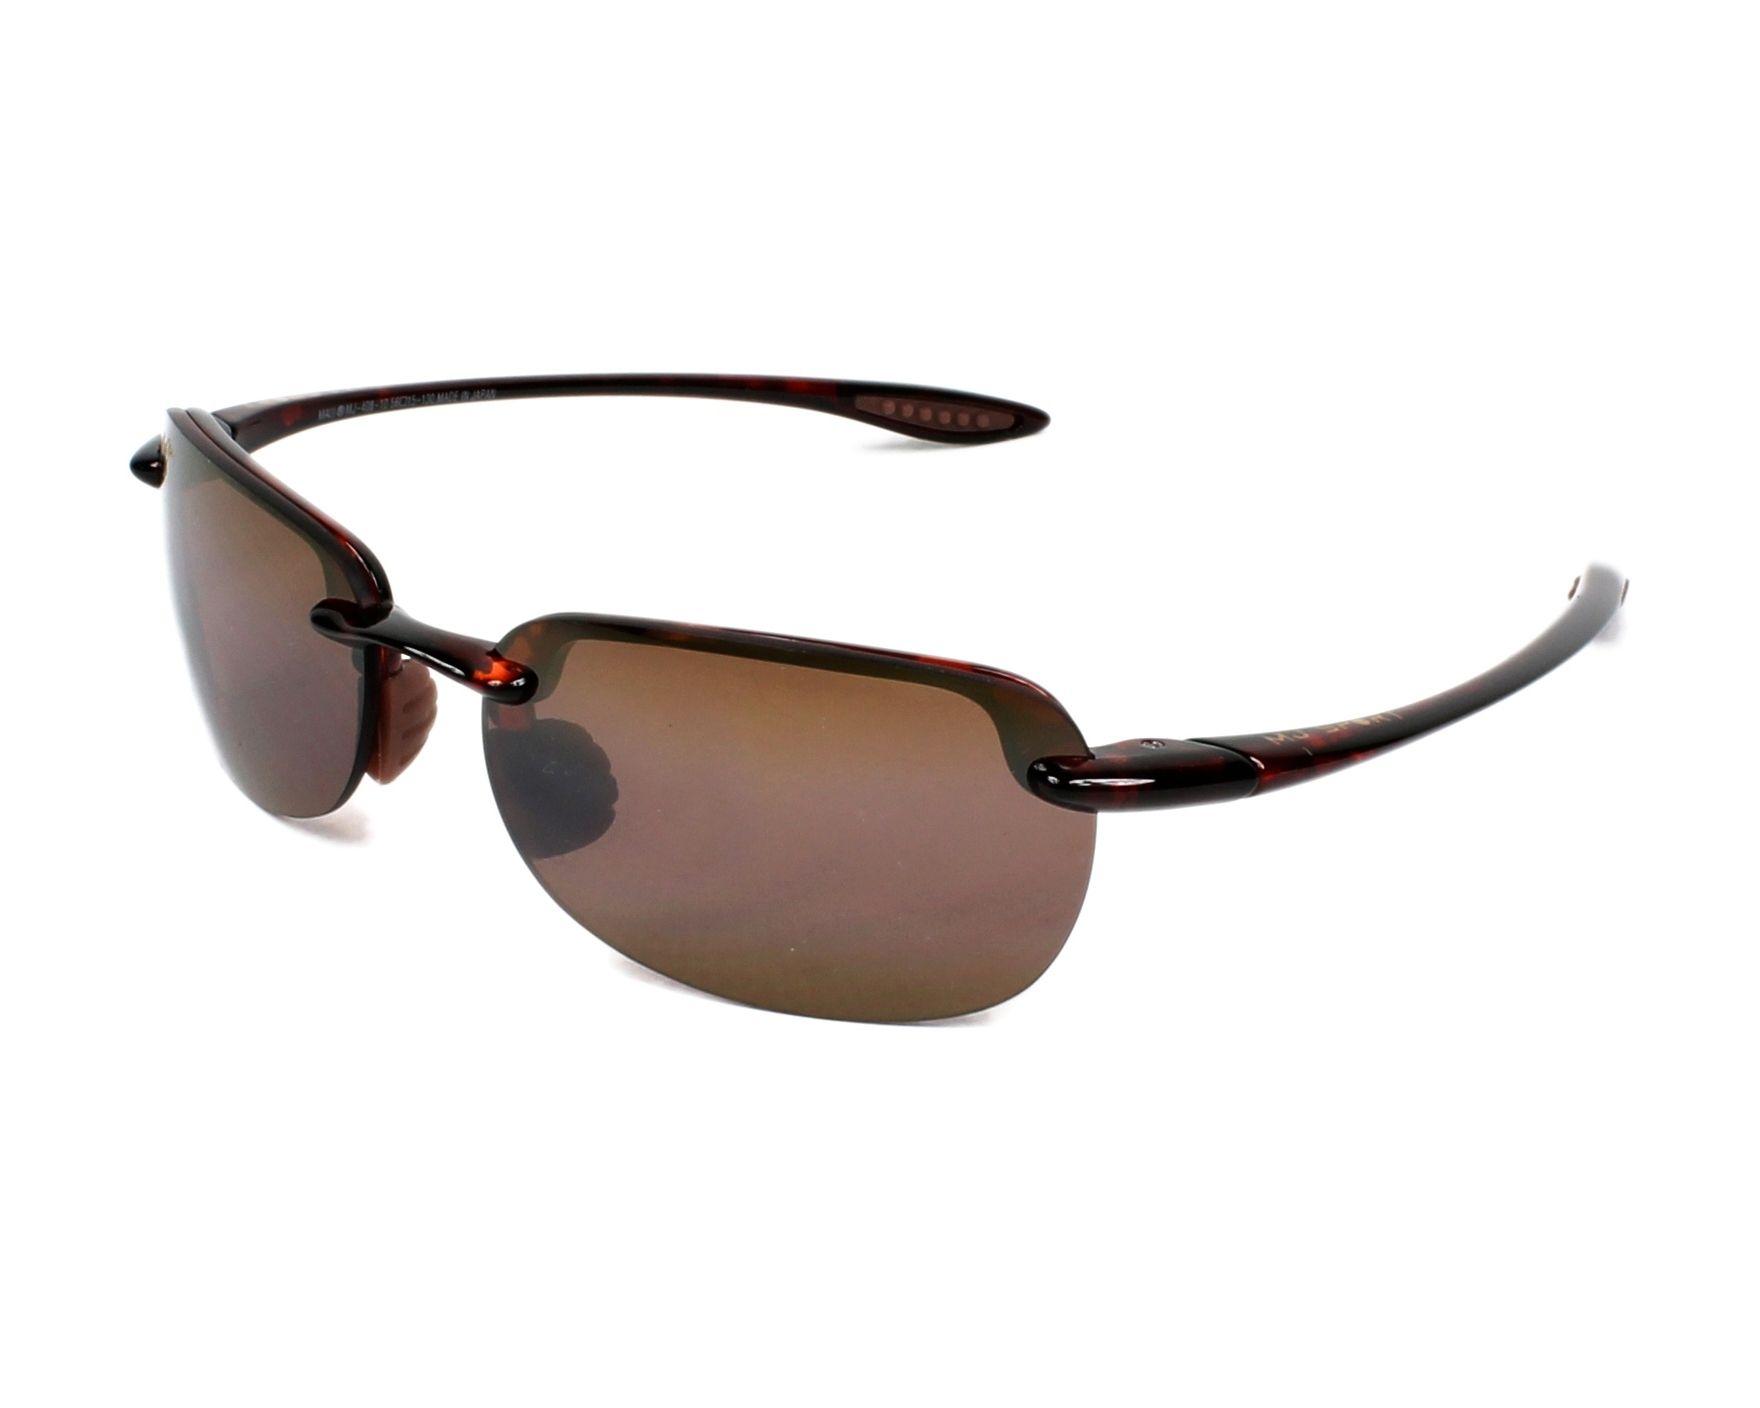 d97bb1c47b891 Sunglasses Maui Jim H-408 10 56-15 Havana profile view